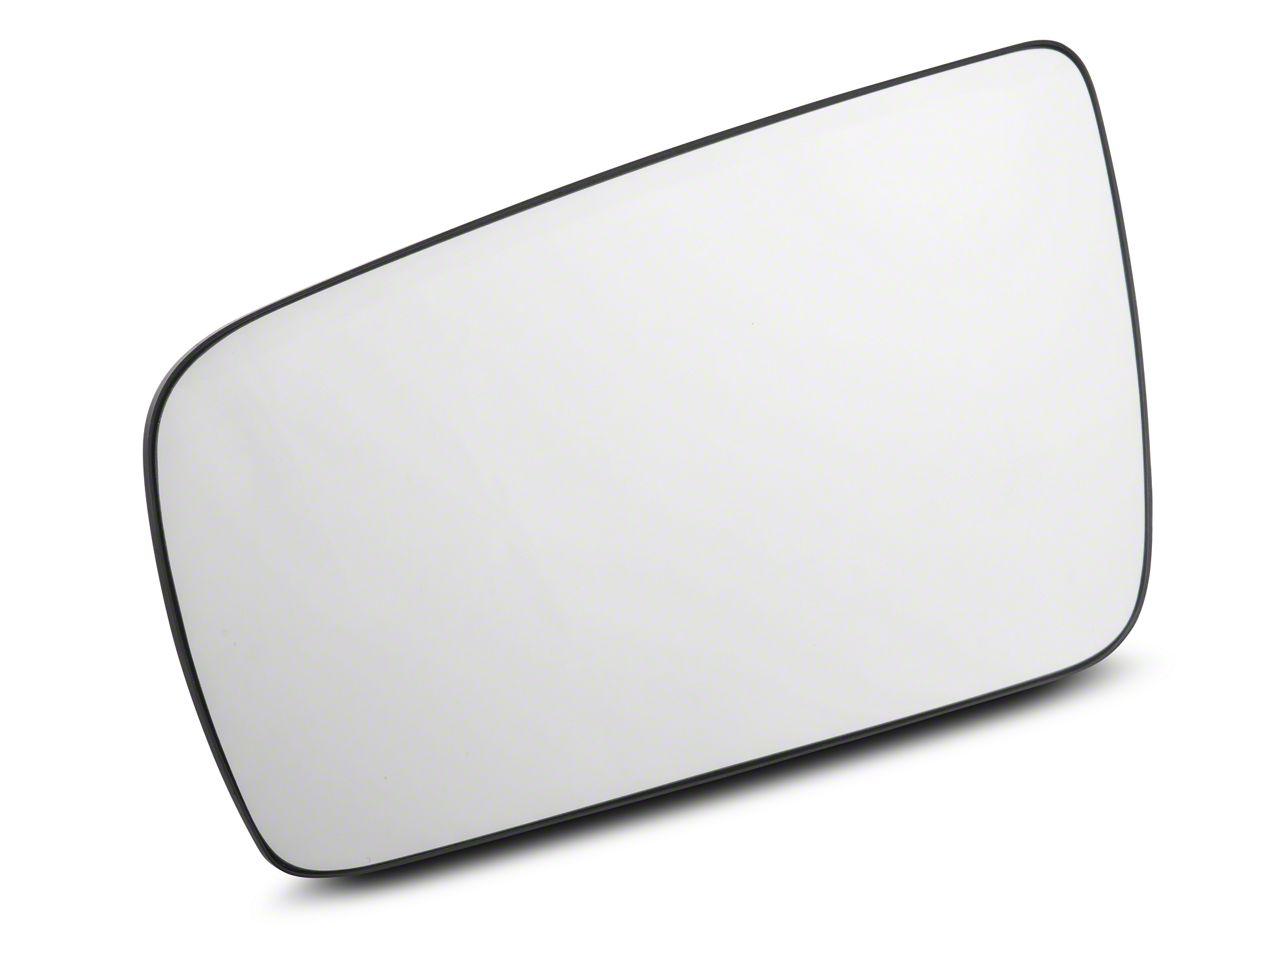 OPR Non-Heated Door Mirror Glass - Left Side (05-09 All)